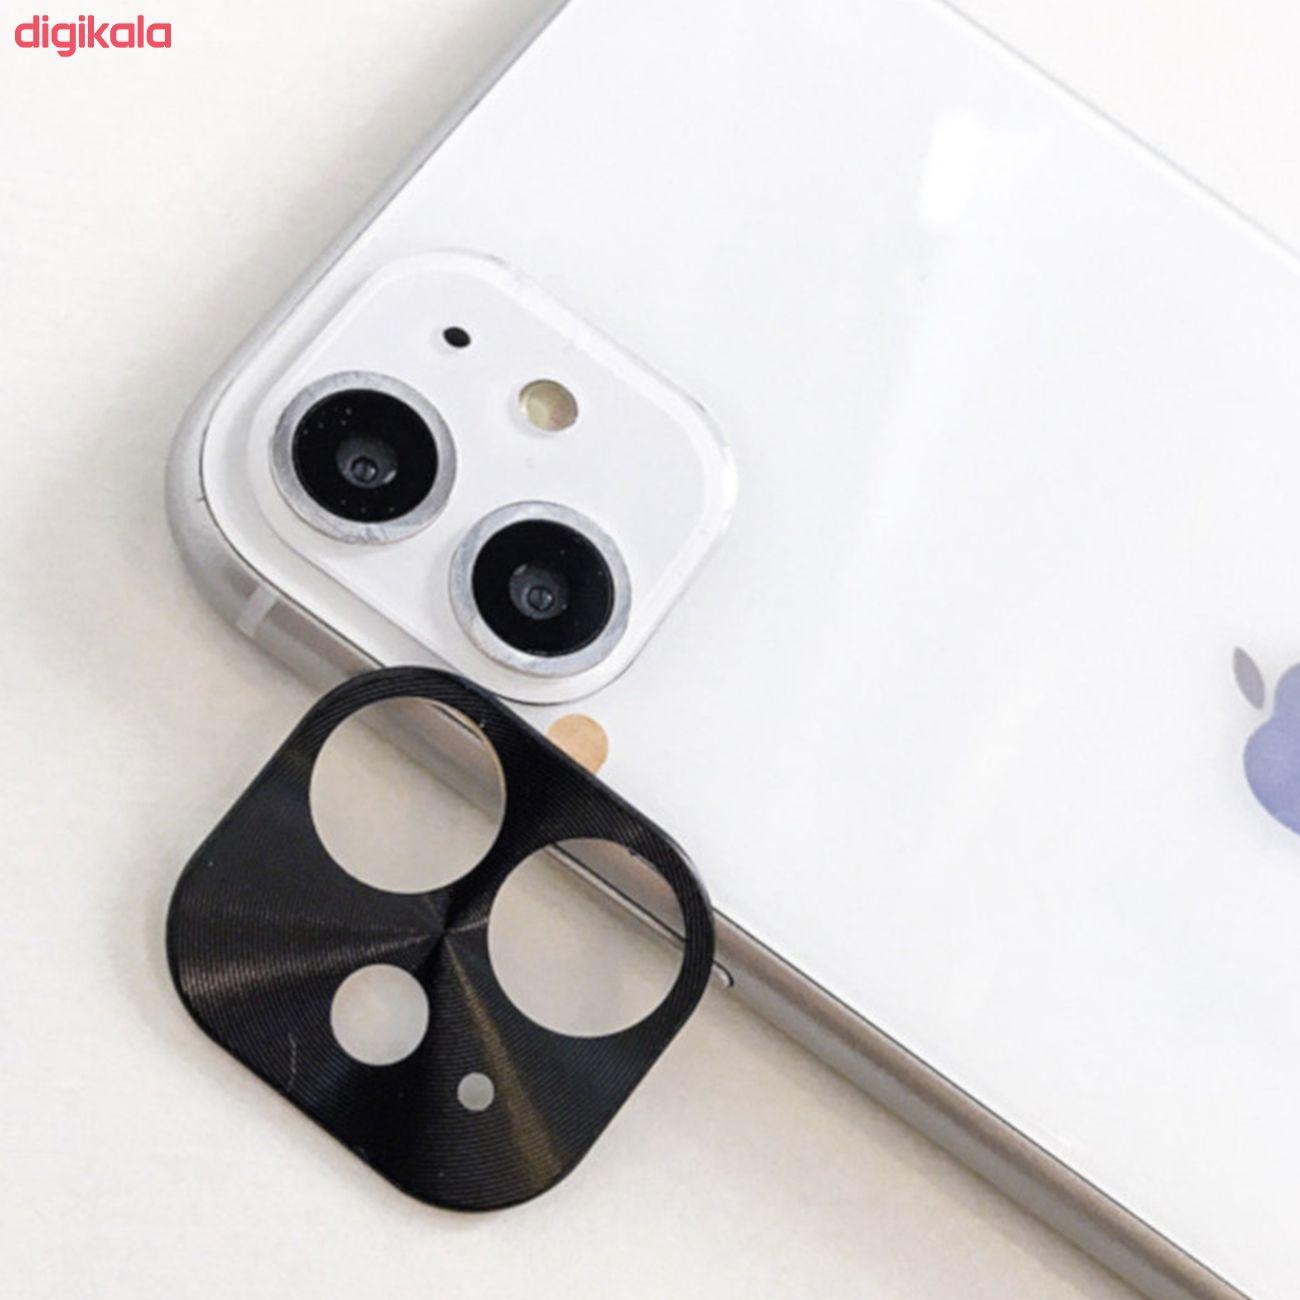 محافظ لنز دوربین مدل Me-1 مناسب برای گوشی موبایل اپل iPhone 11 main 1 2